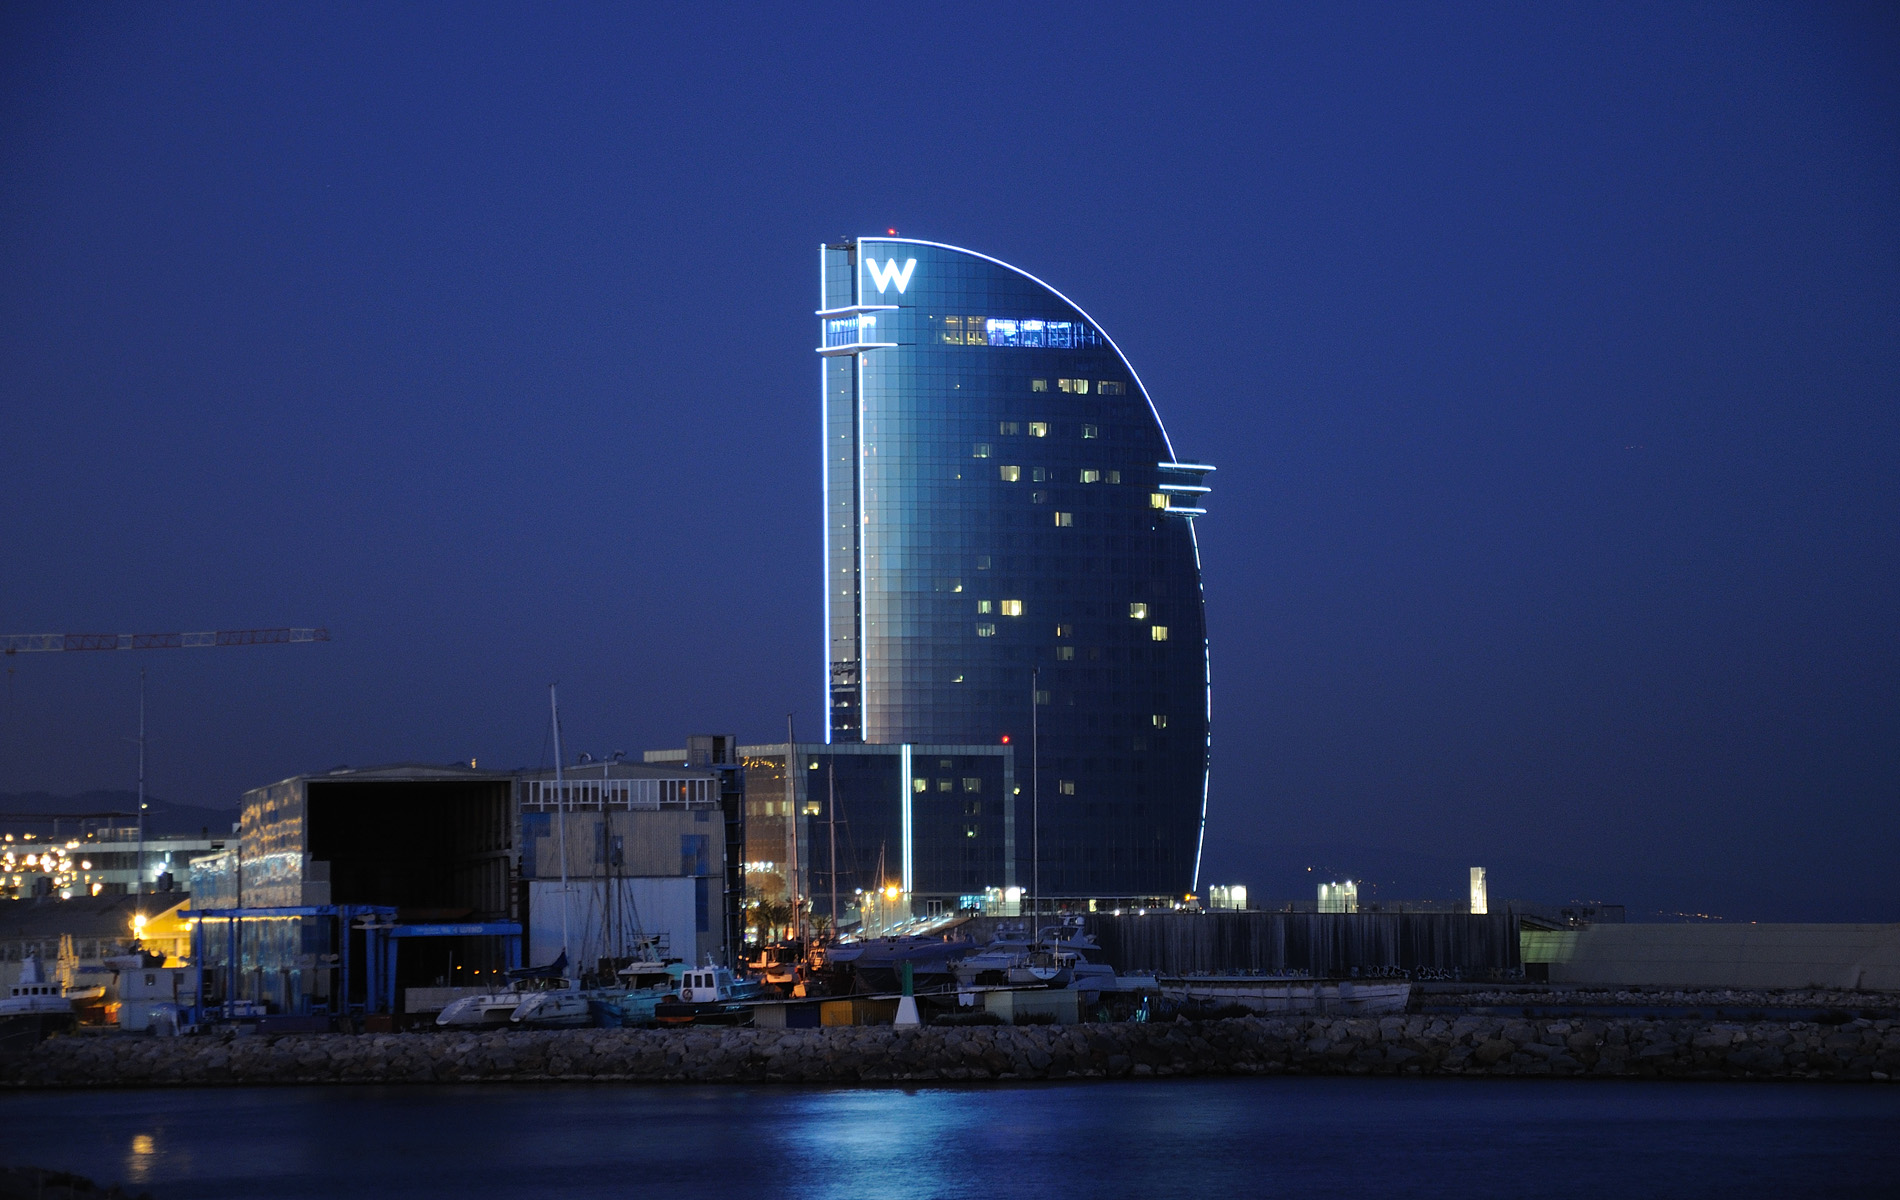 Hotel w barcelona ricardo bofill taller de arquitectura for Hotel w barcelona restaurante